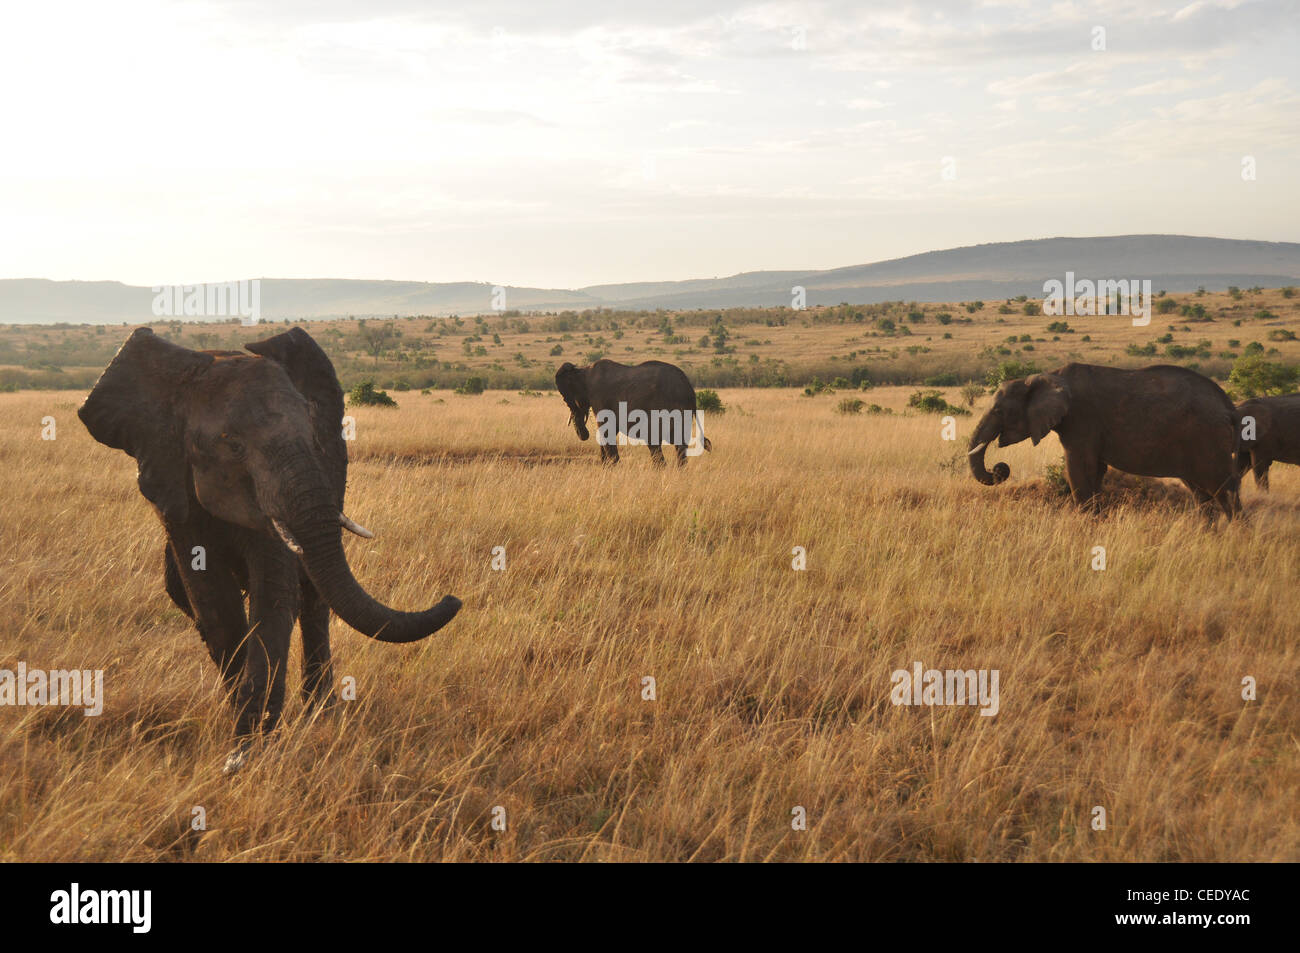 Elephants int the Savanna - Stock Image